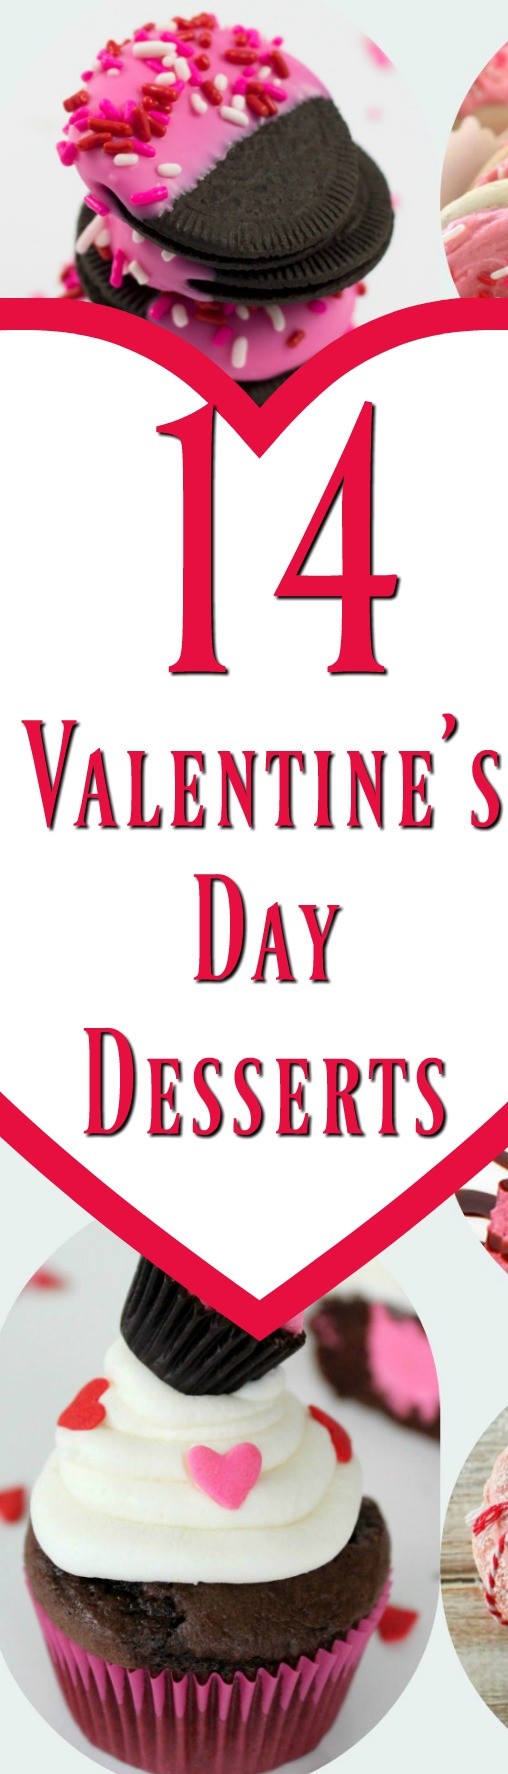 valentines-day-recipes-dessert-sweet-treats-pin.jpg